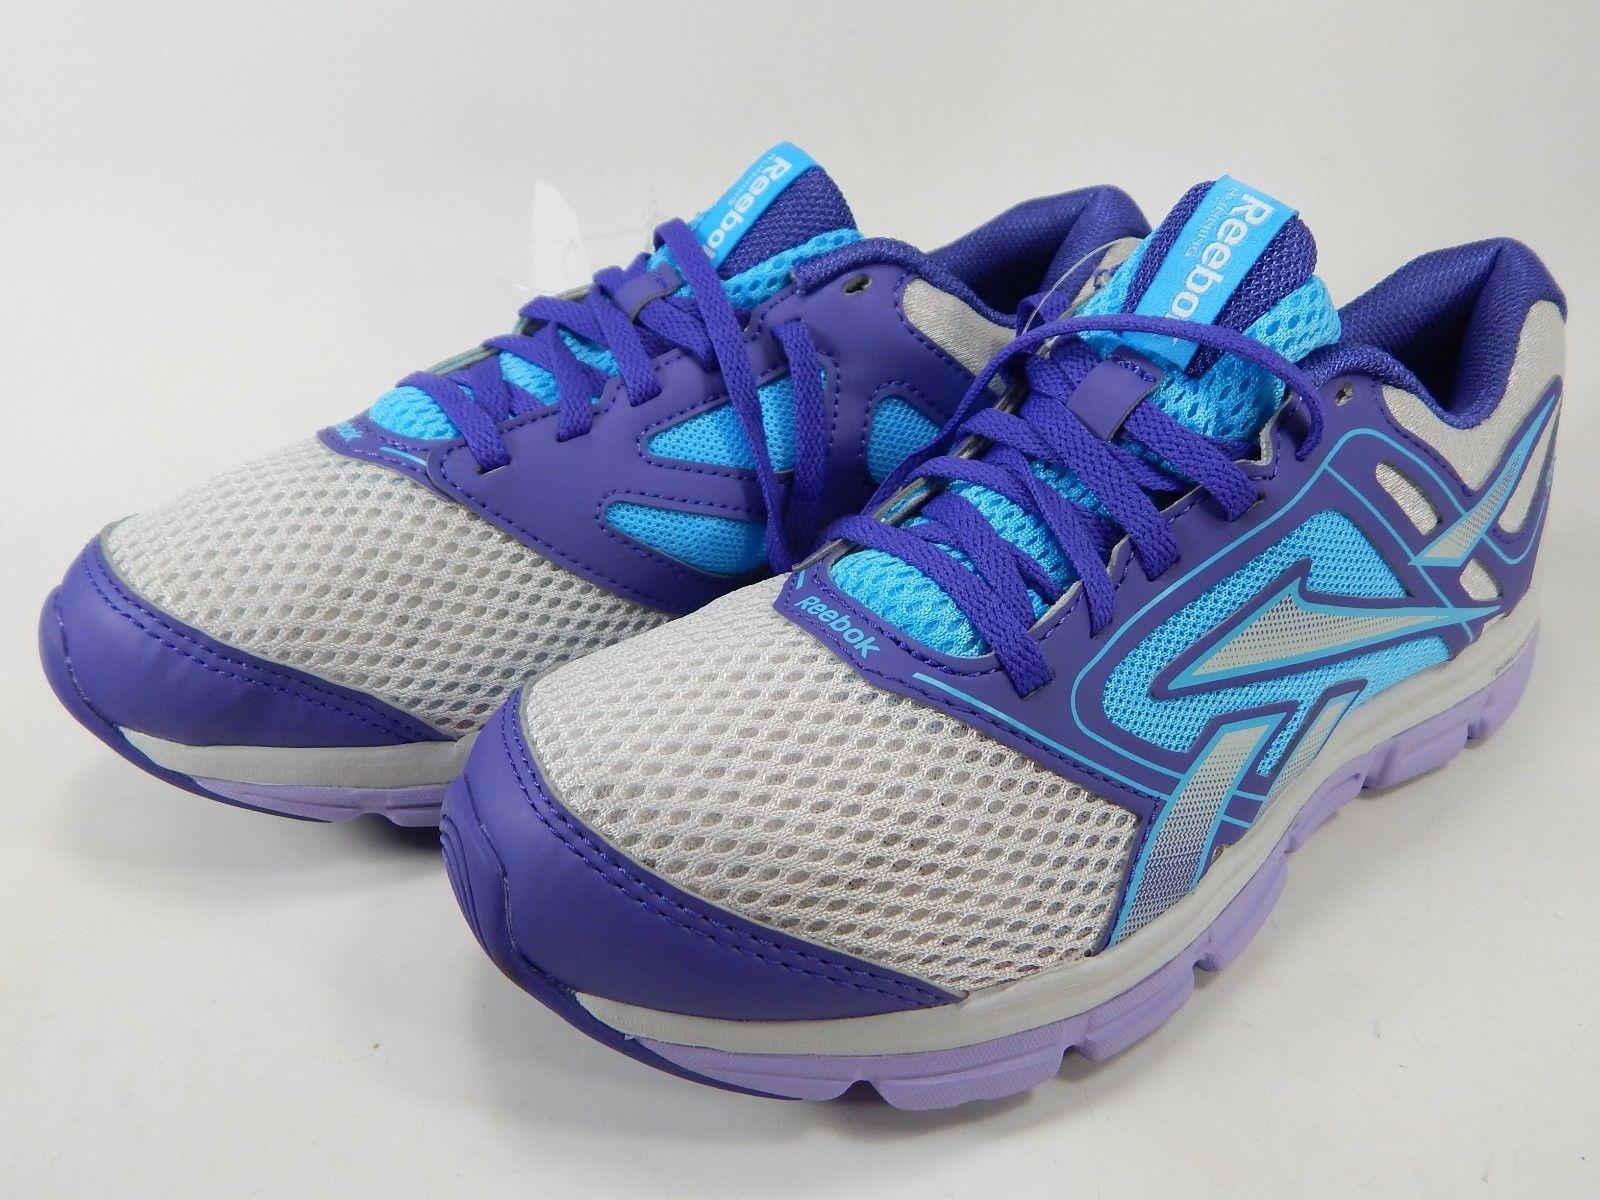 Reebok Dual Turbo Flier Size US 7 M (B) EU 37.5 Women's Running Shoes Purple